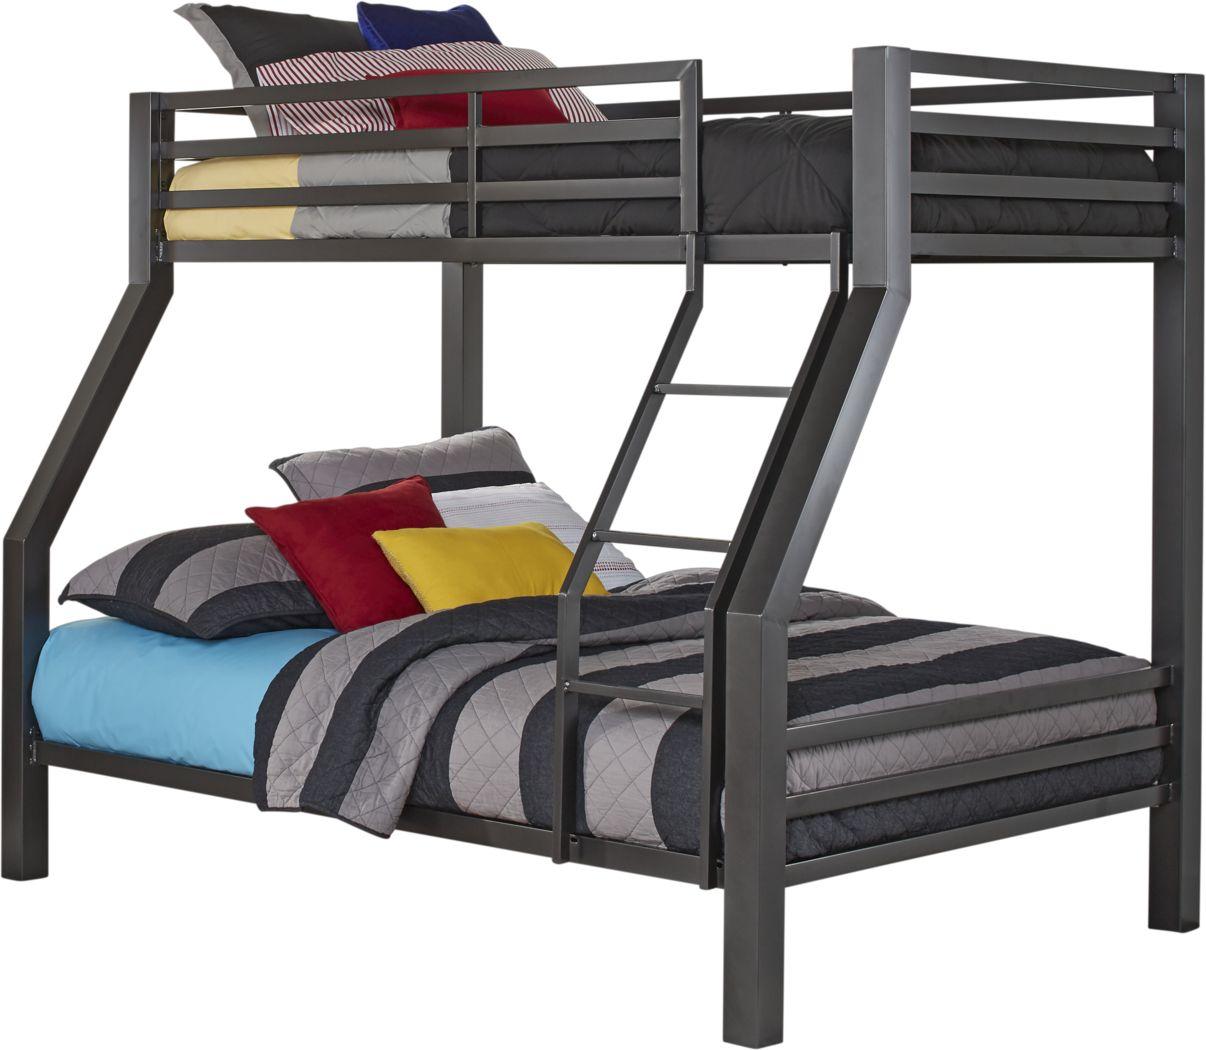 Xander Gray Twin/Full Bunk Bed